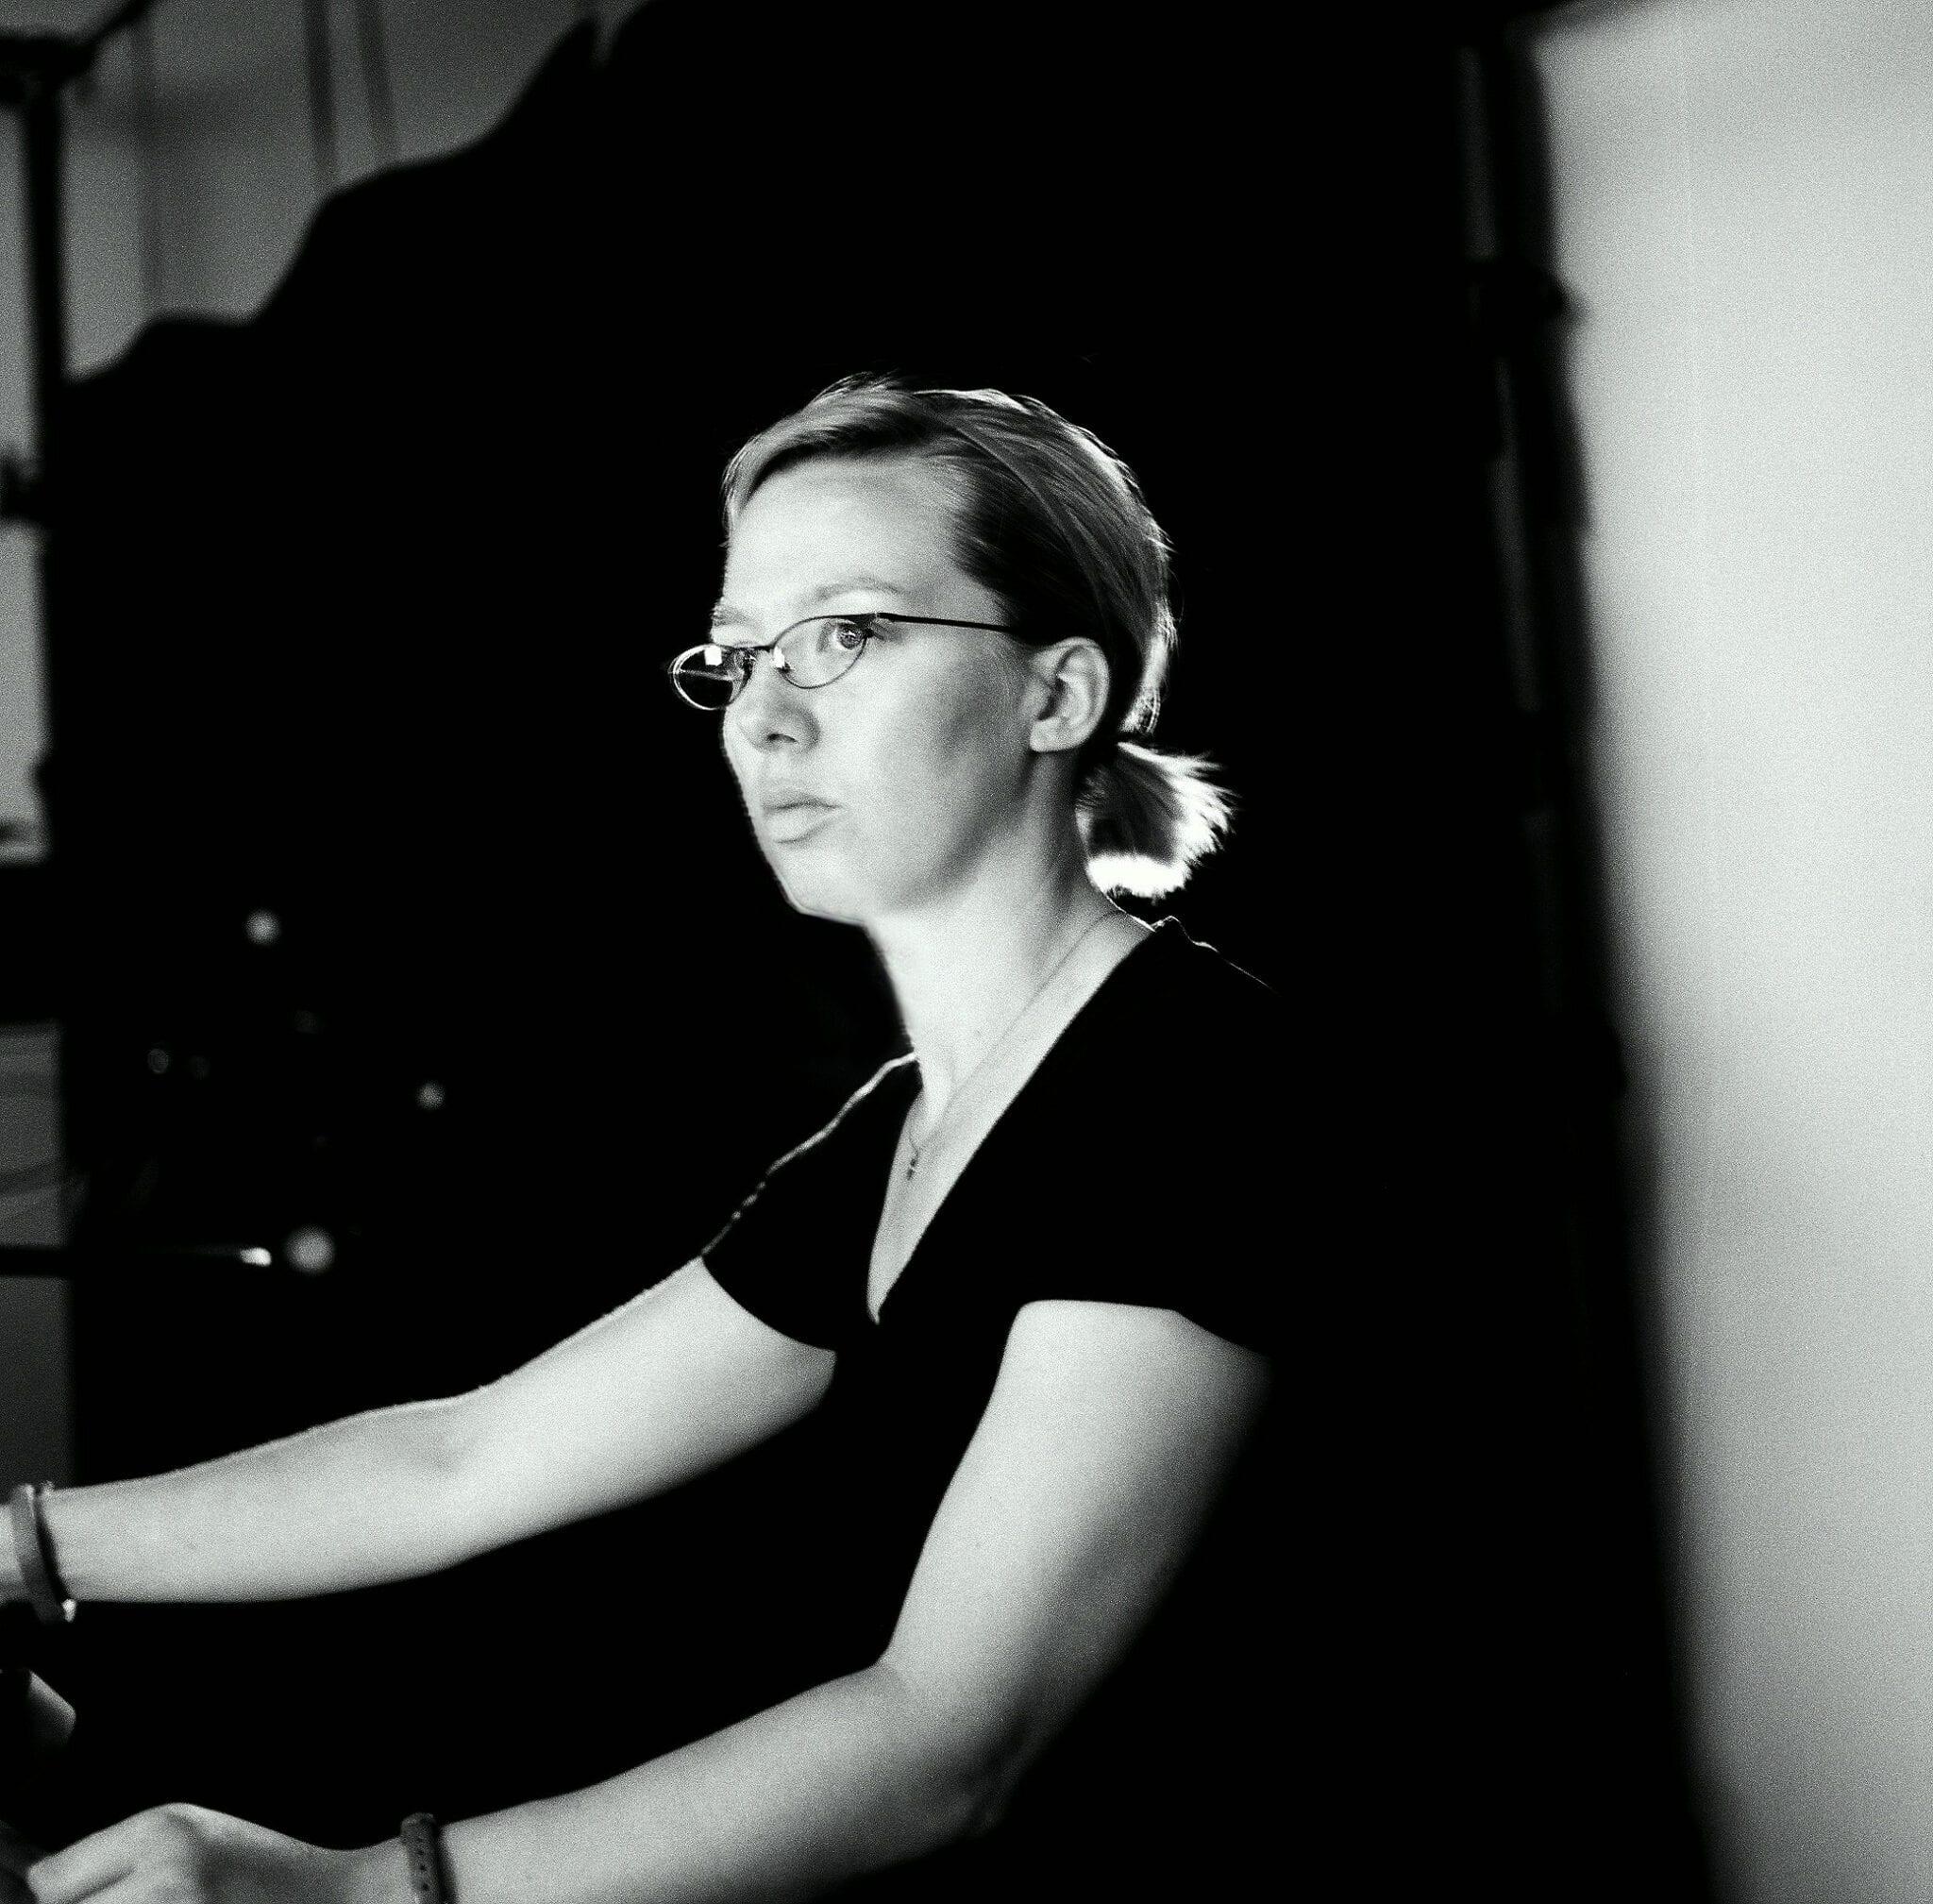 Jillian Arnold